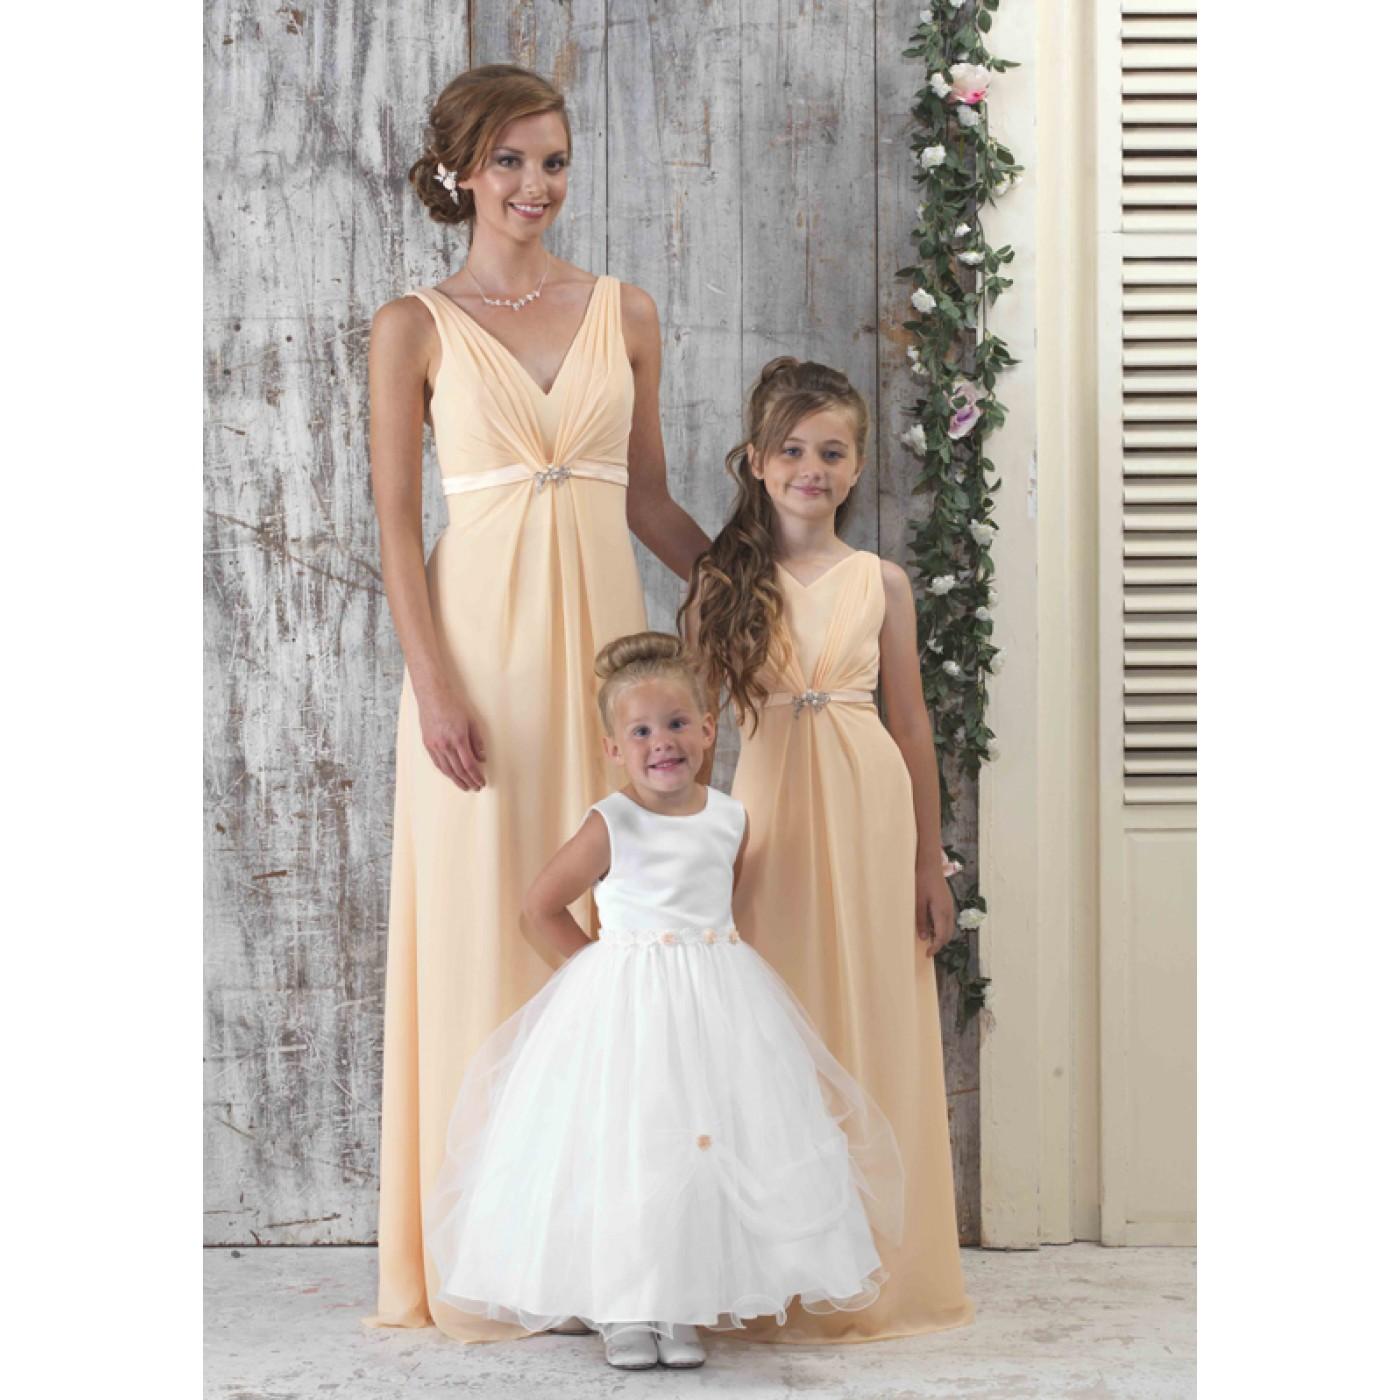 Linzi jay en339 bridesmaid dress dressy dresses linzi jay en339 bridesmaid dress ombrellifo Gallery